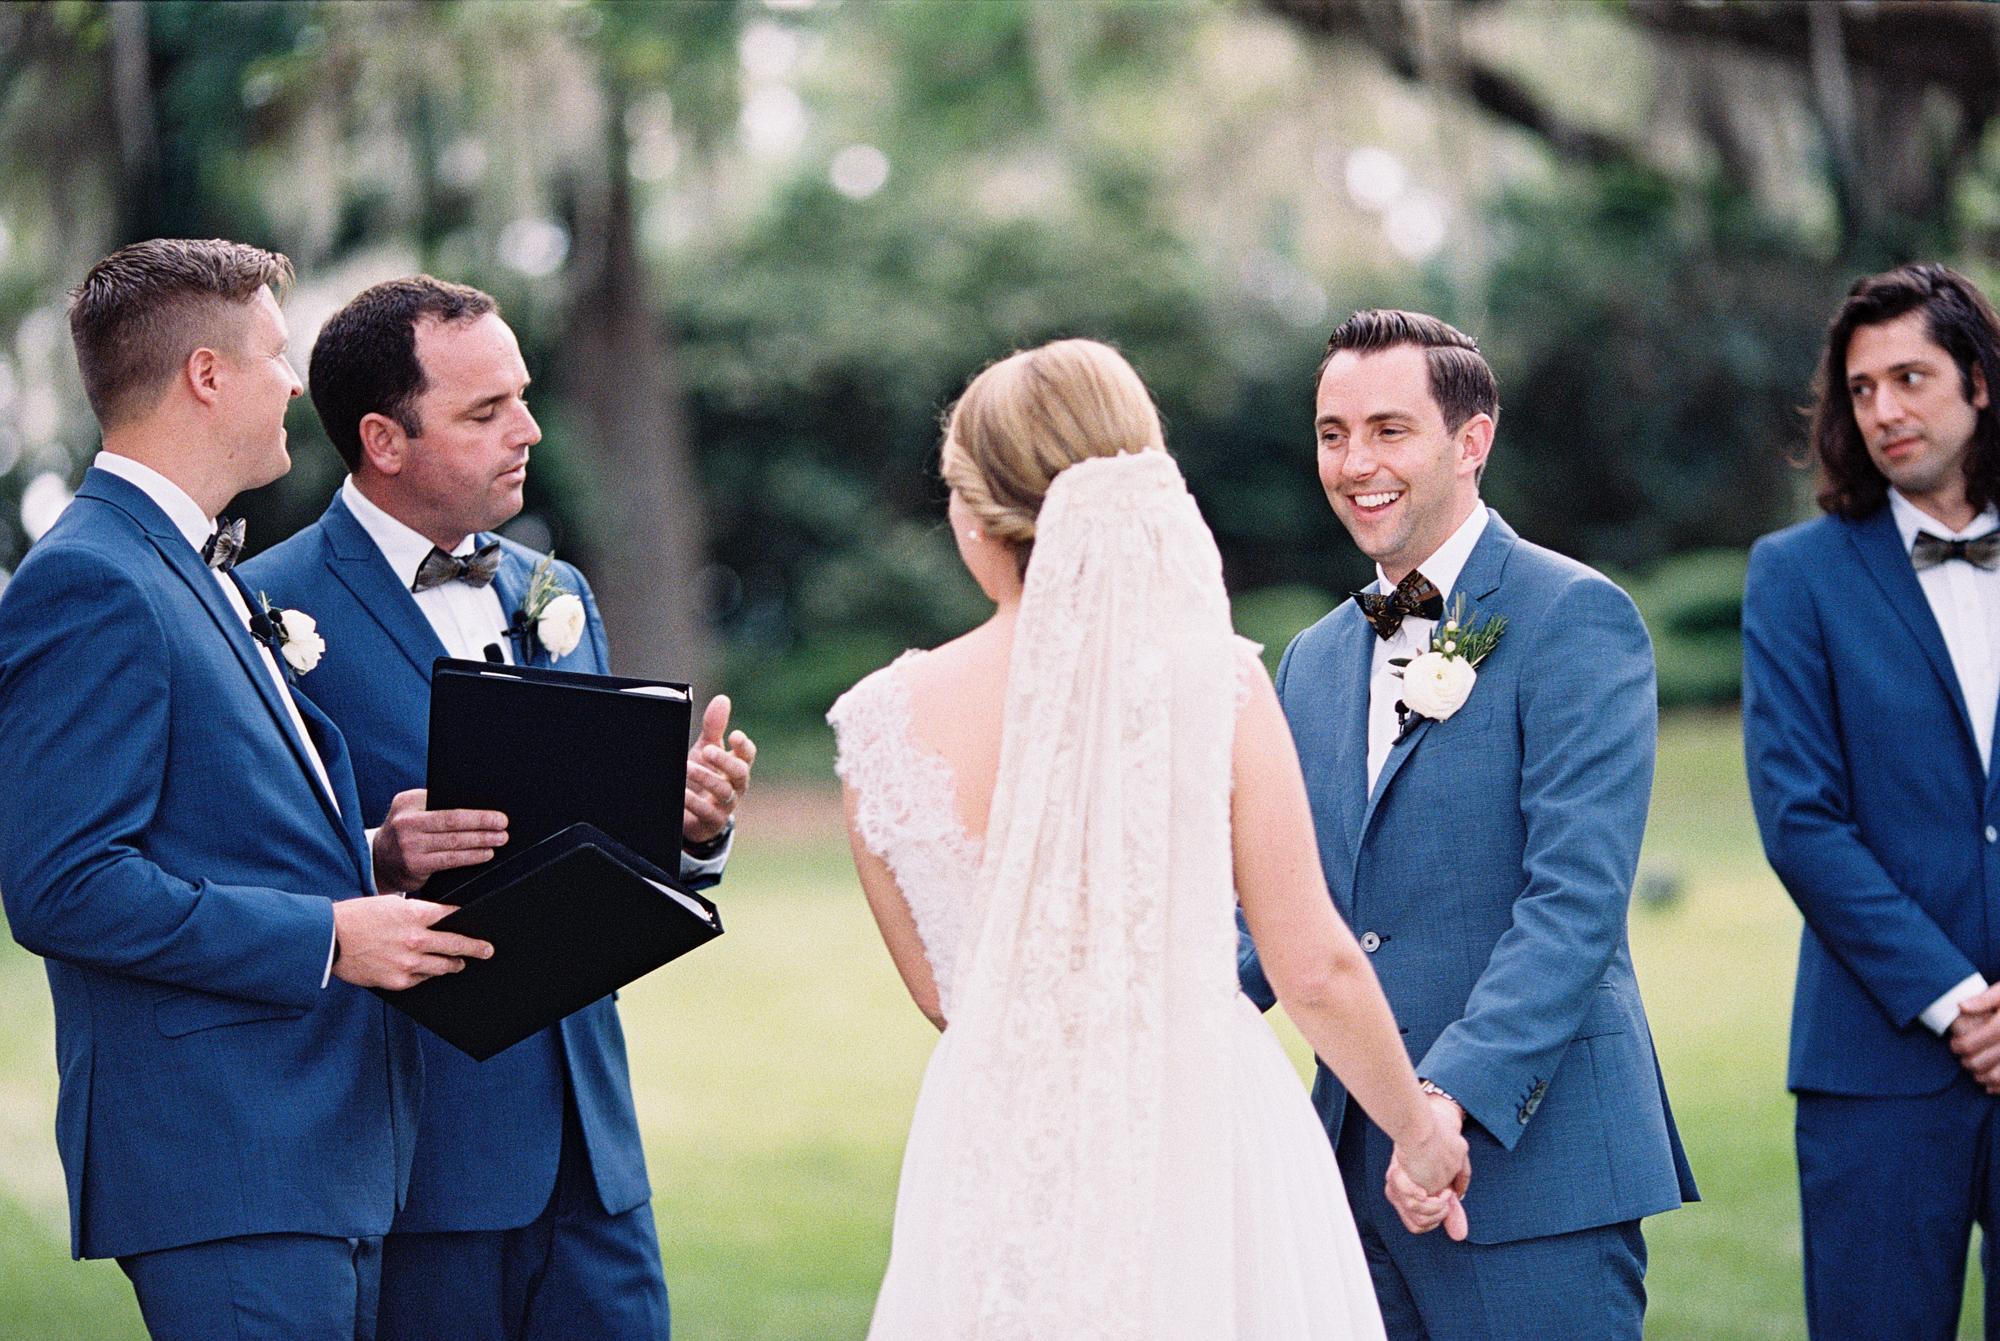 southern-wedding-12.jpg